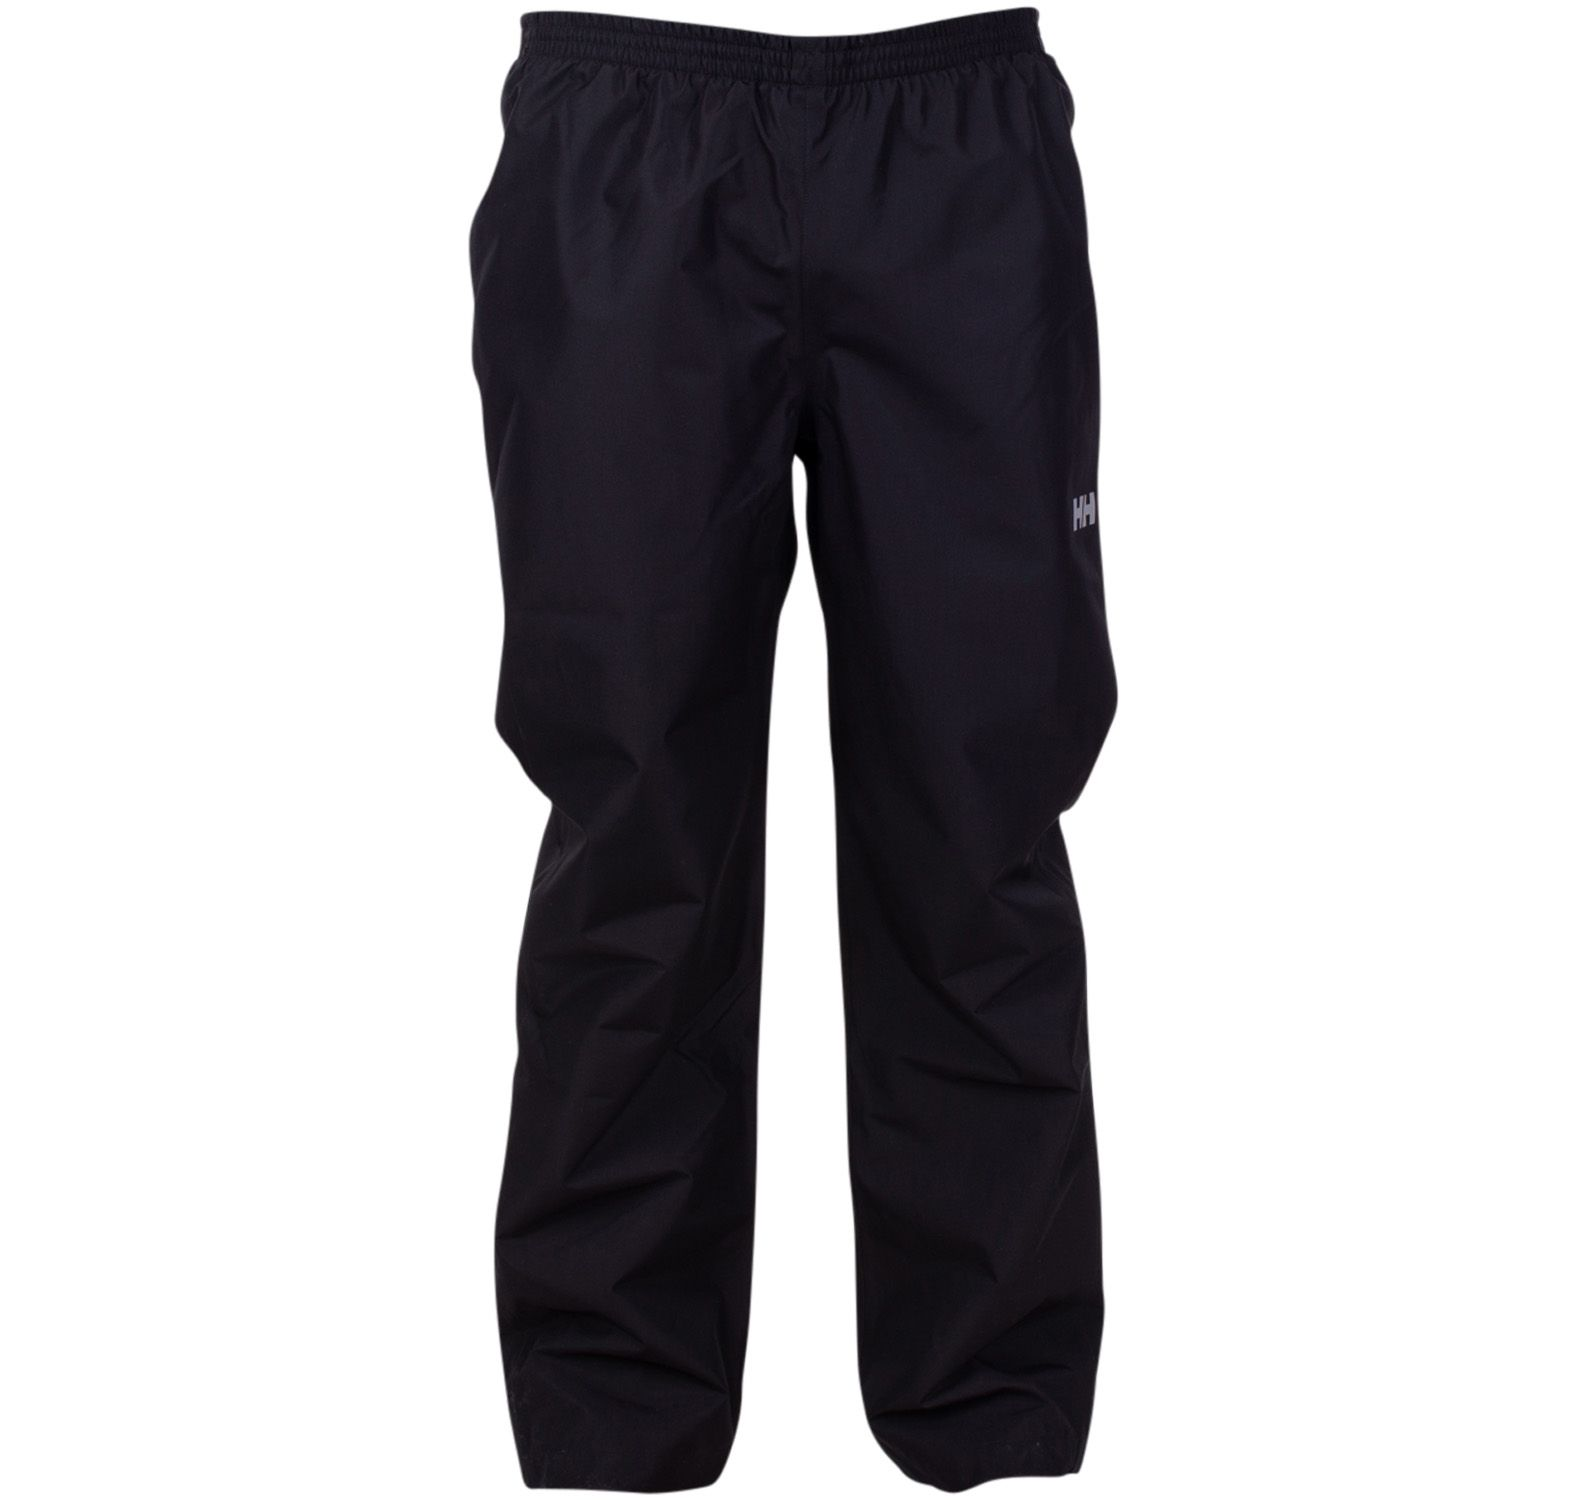 jr dubliner pant, 990 black, 140